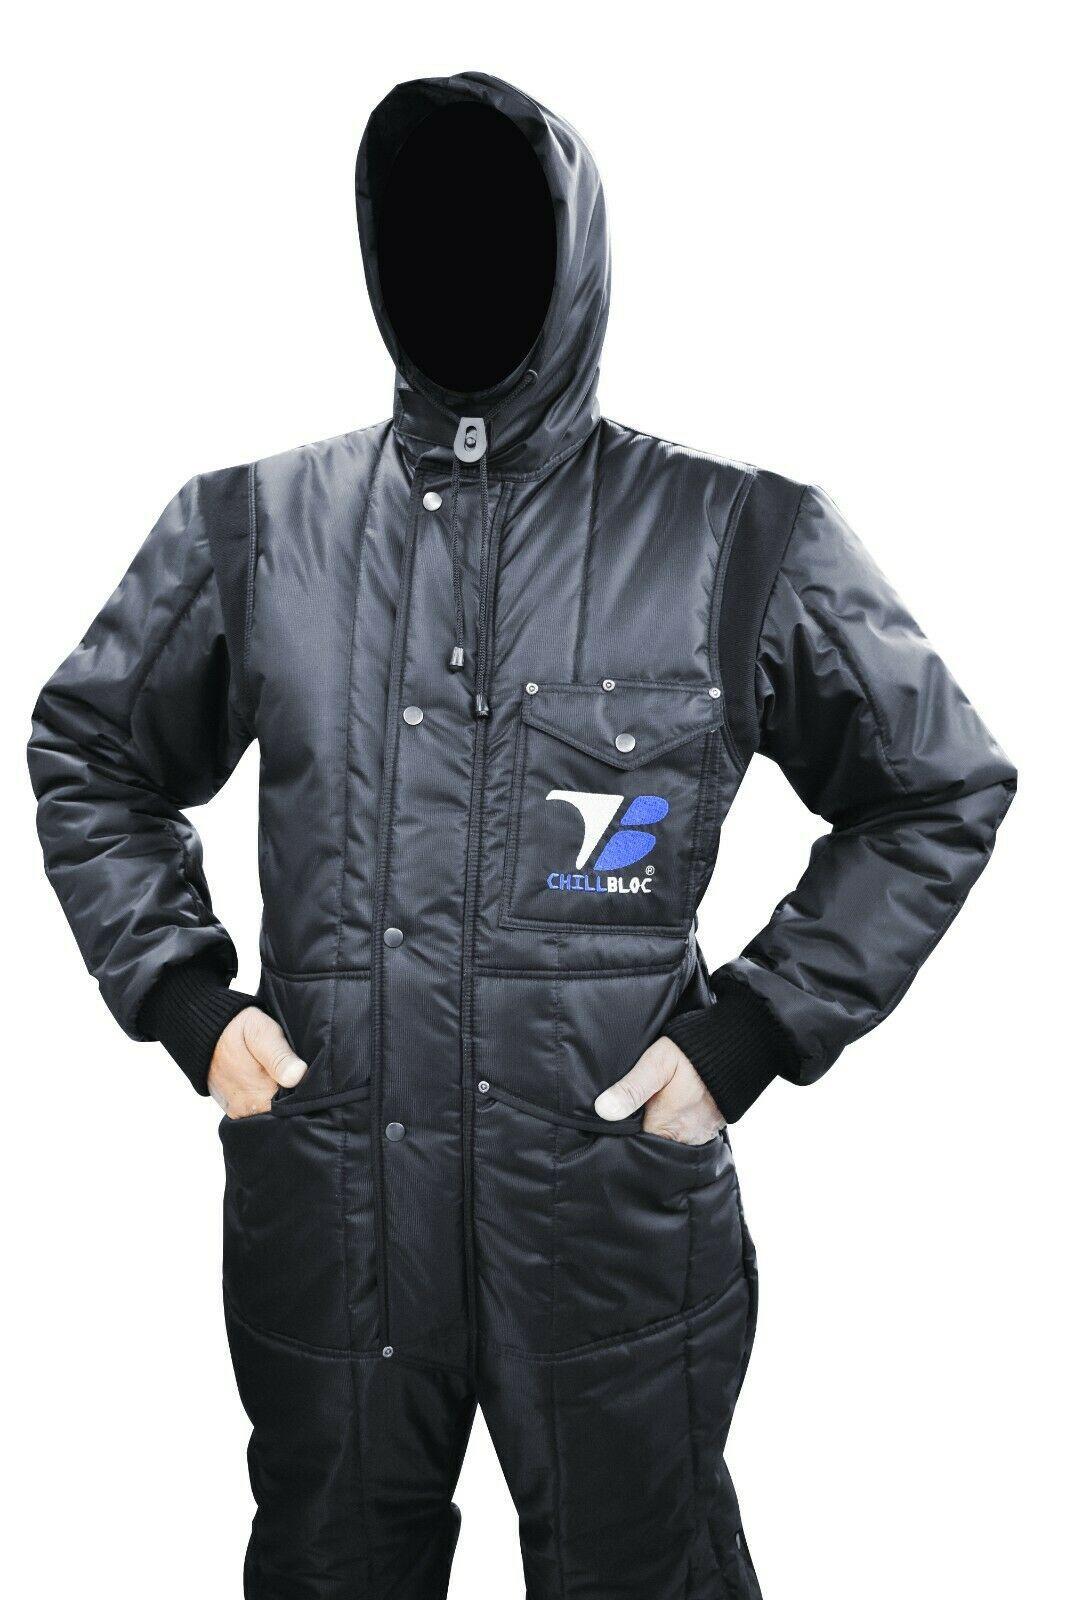 Tecbro Chill Bloc 50°F Freezer Suit Coverall Extreme Cold